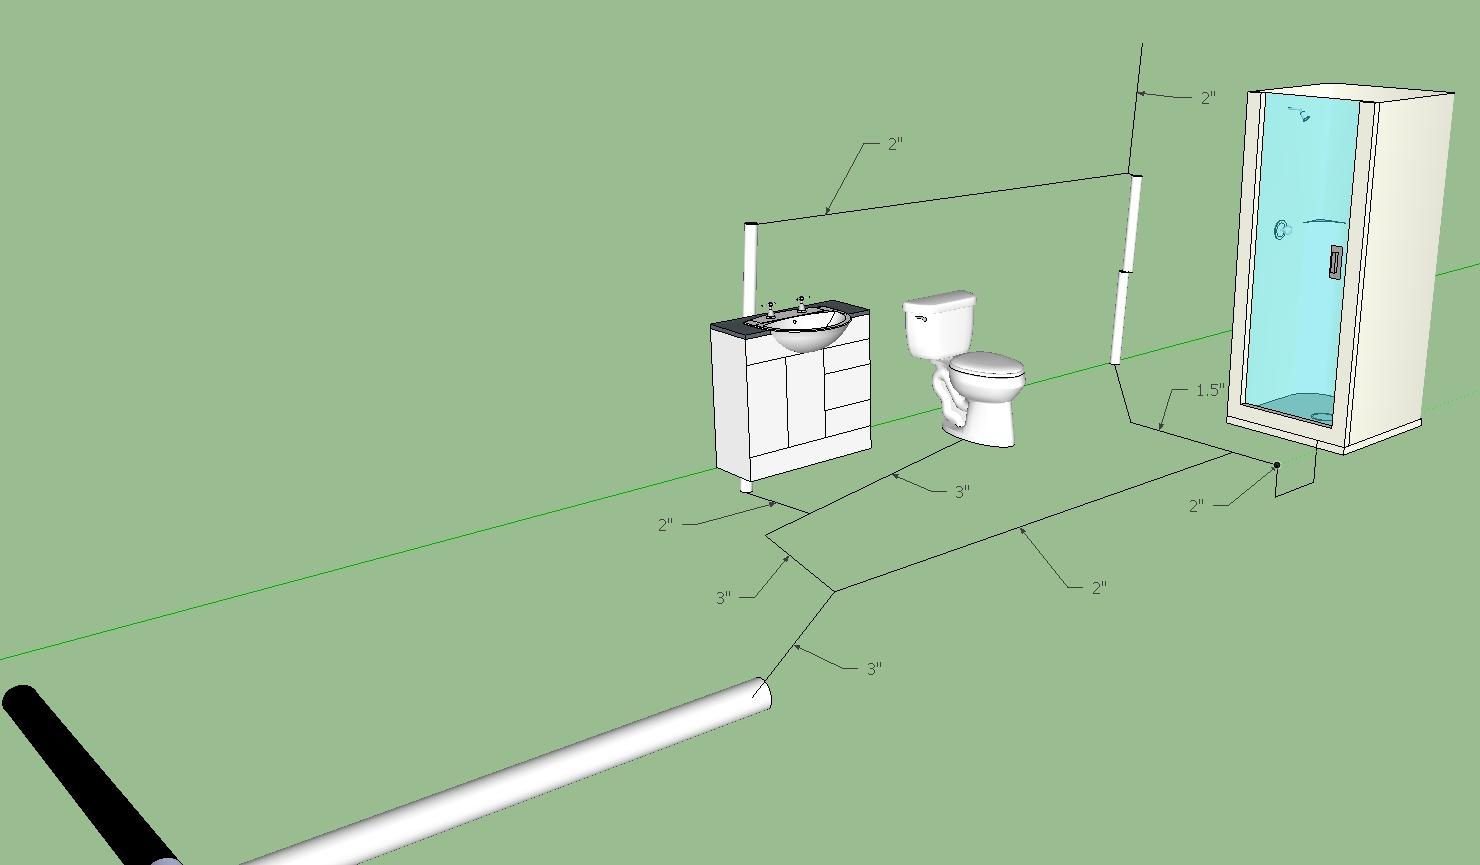 Basement Toilet Drain Diagram